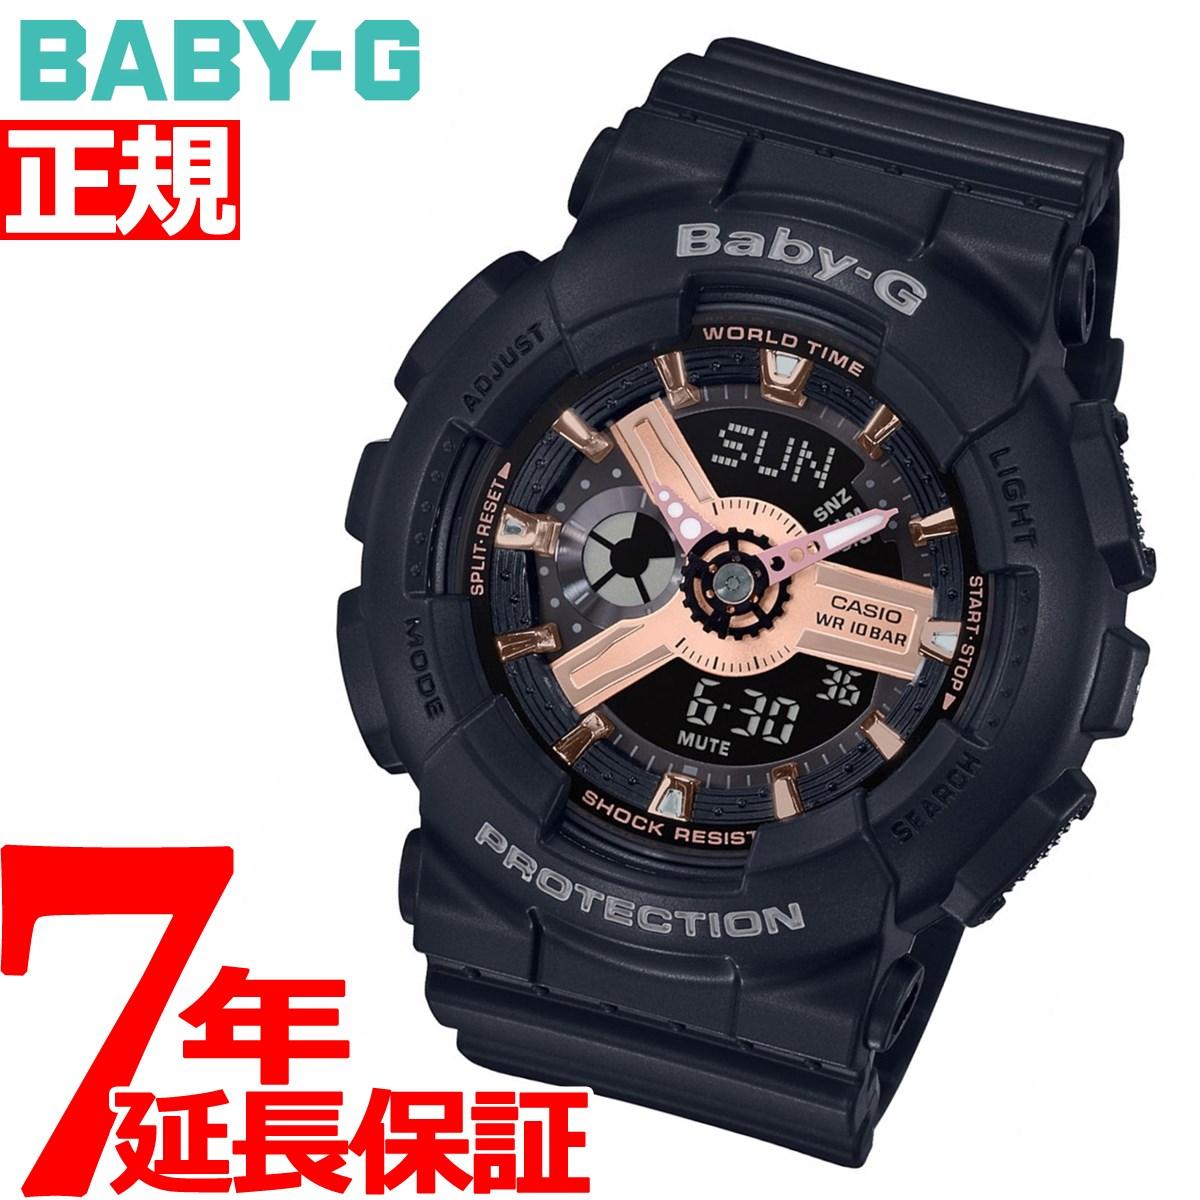 【SHOP OF THE YEAR 2018 受賞】BABY-G カシオ ベビーG レディース 腕時計 BA-110RG-1AJF【2018 新作】